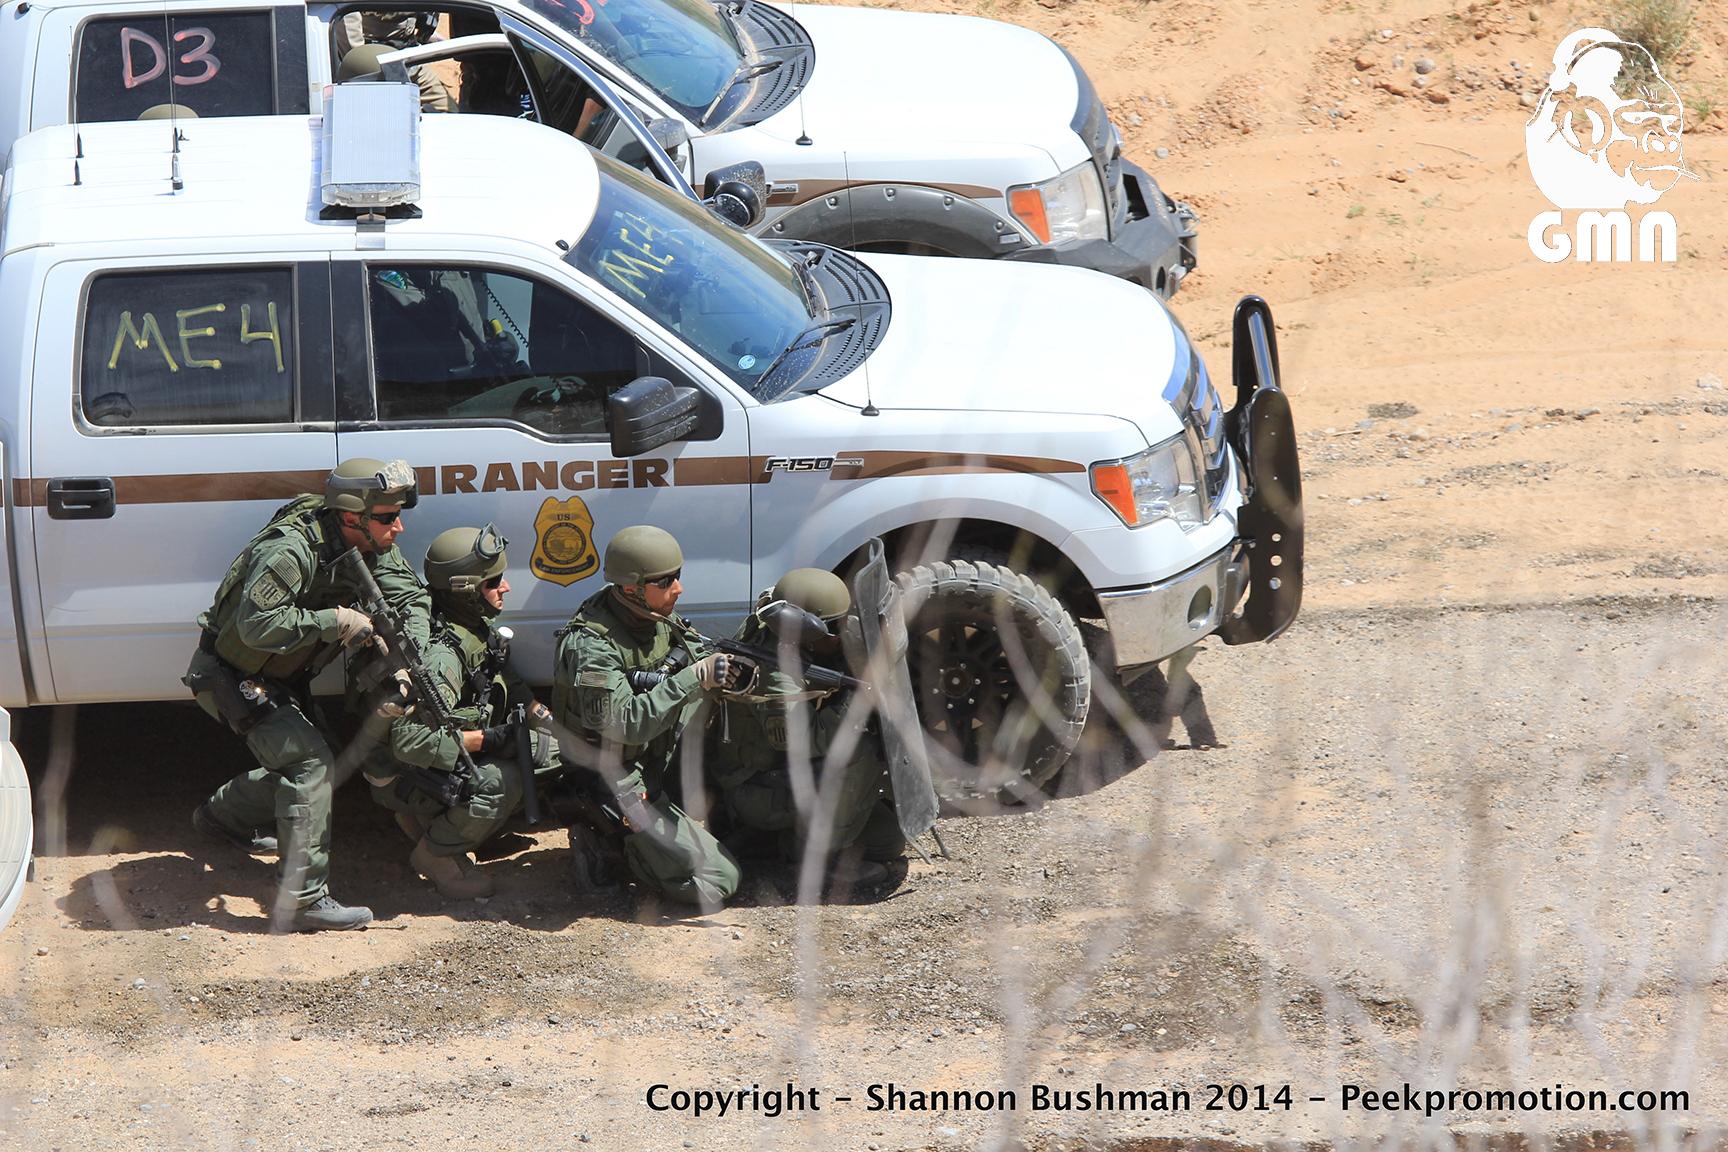 21WIREn-Bundy-Fed-Standoff-April-12-2014-Copyright-GMN